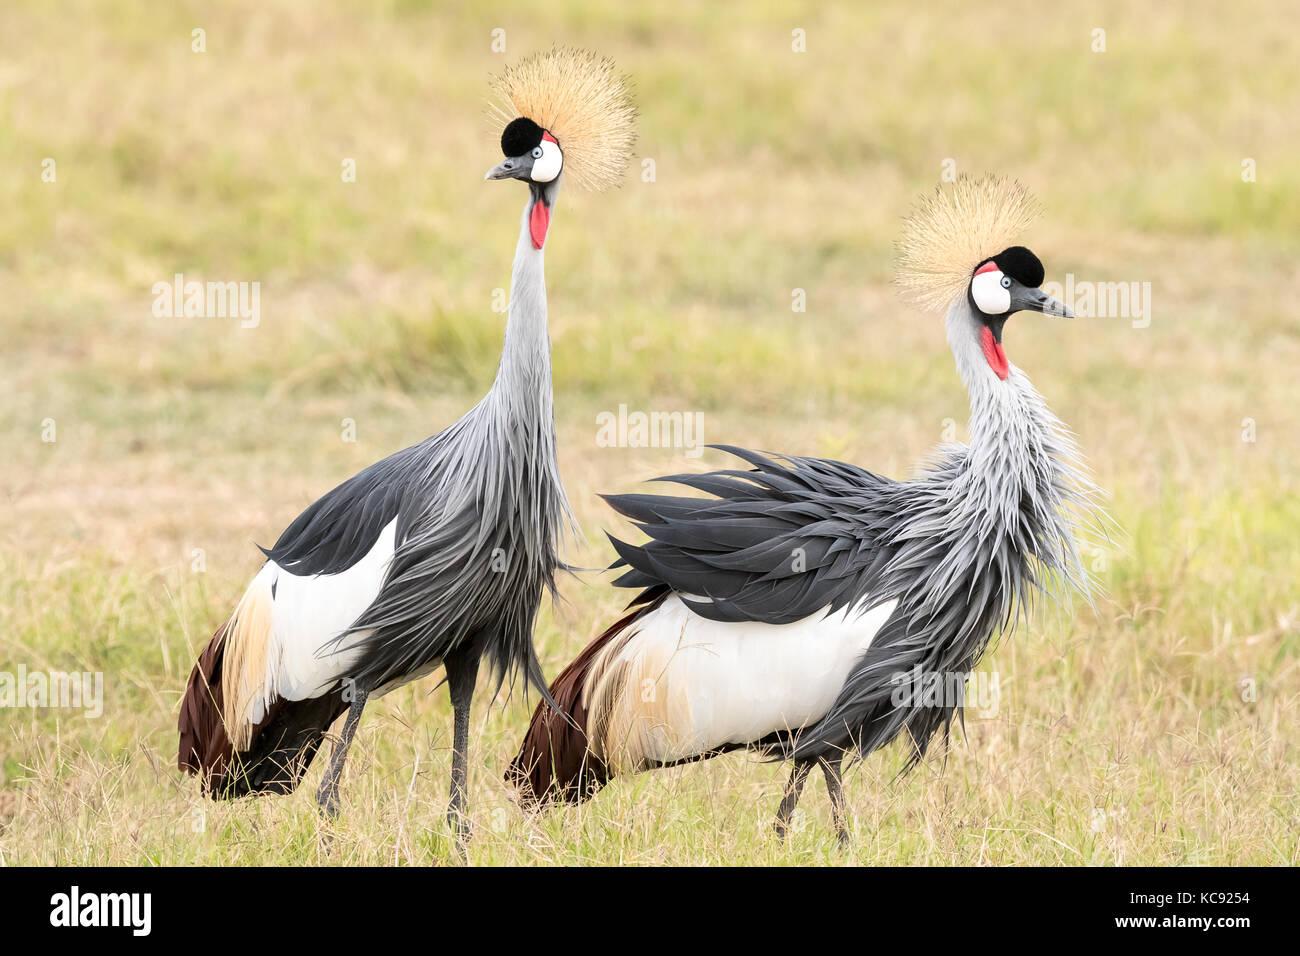 Una coppia di Grey Crowned Crane è stato rovistando a Amboseli National Park in Kenya. Grey Crowned Crane è Immagini Stock